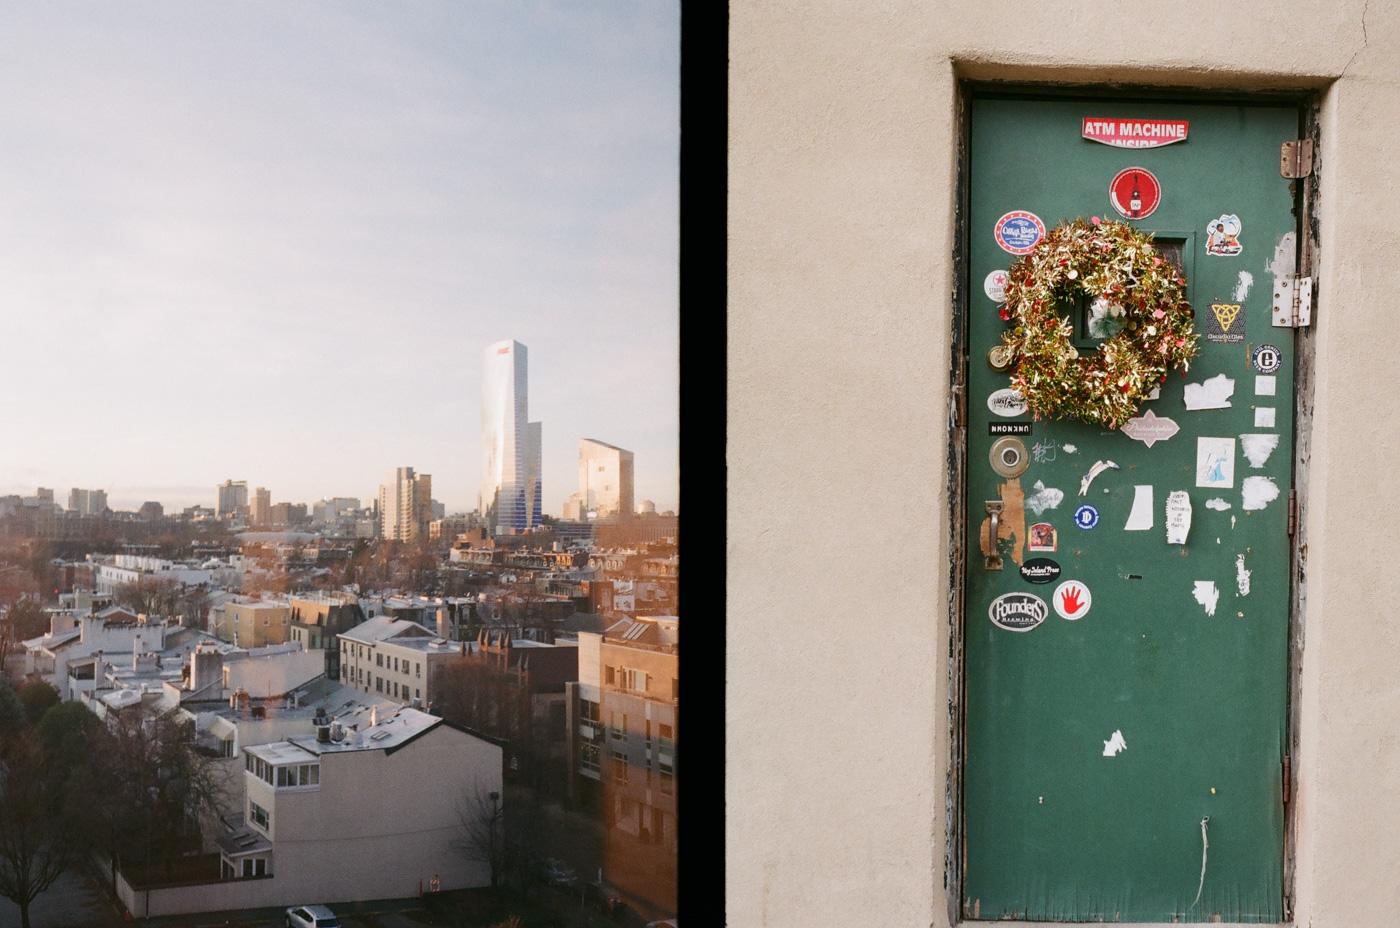 FMC Tower and Doobies at Christmas